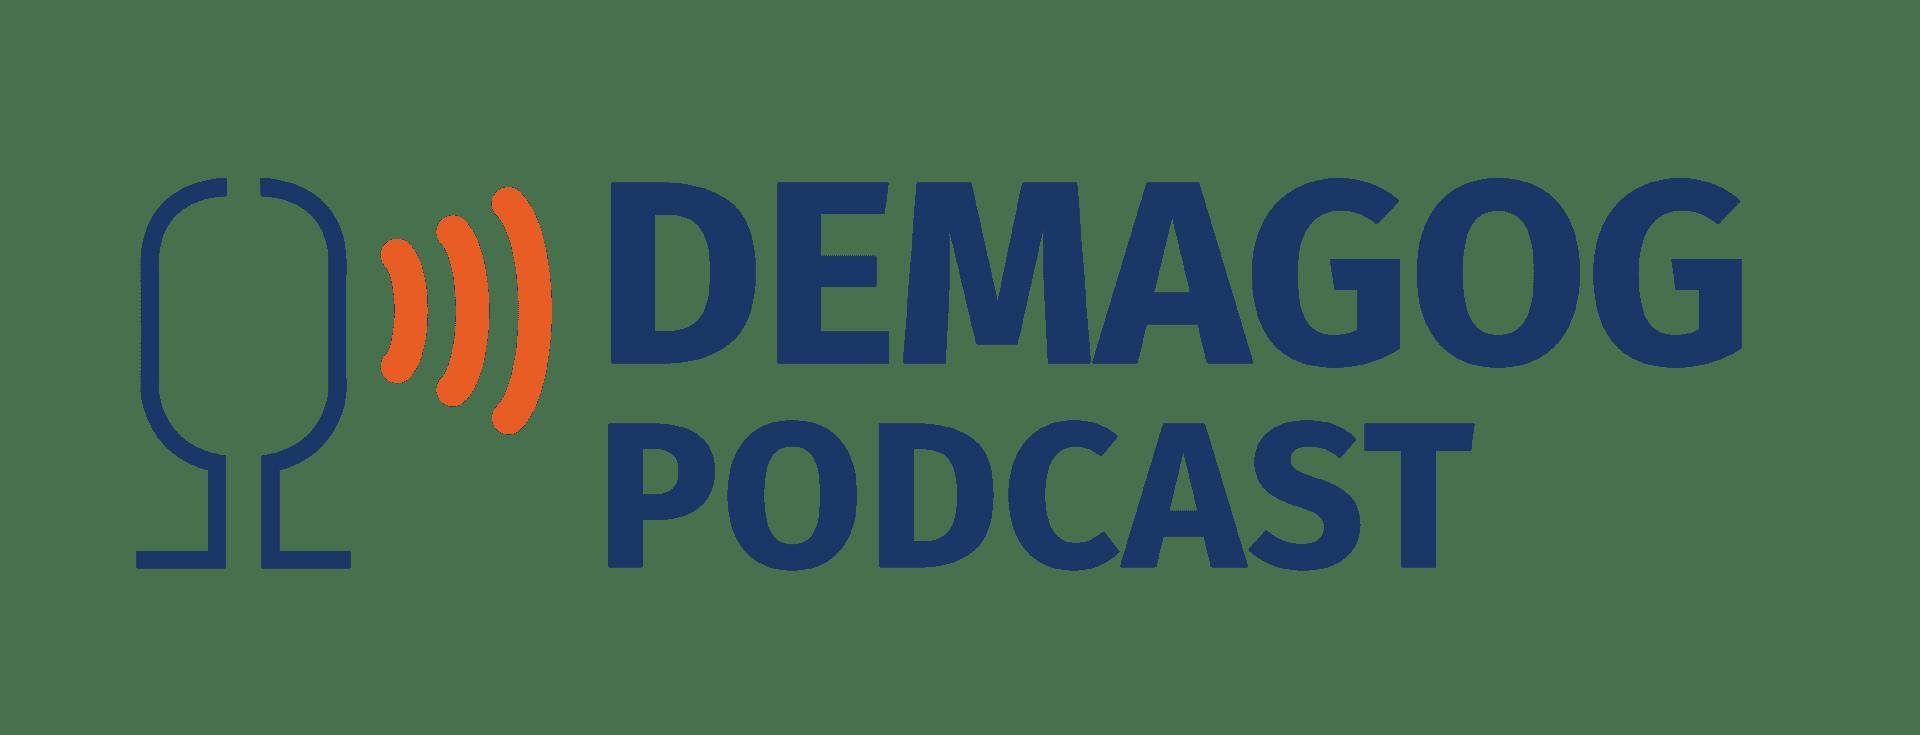 Podcast Demagoga. Fake news podkontrolą!